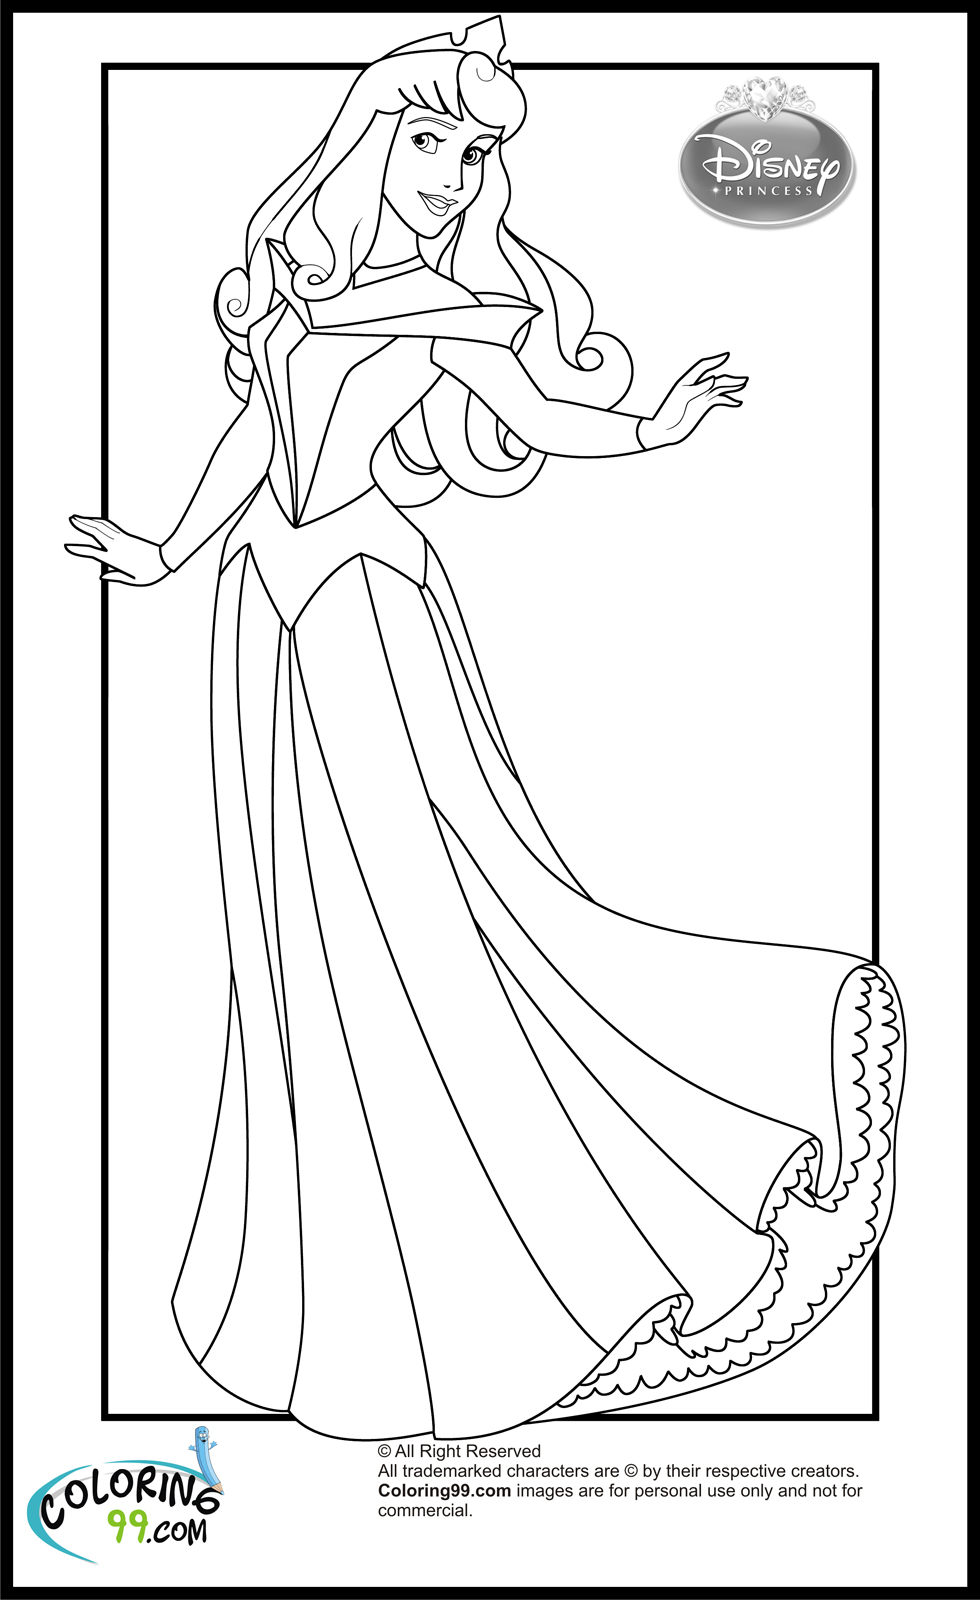 Disney Princess Coloring Pages | Team colors | colouring pages for disney princesses